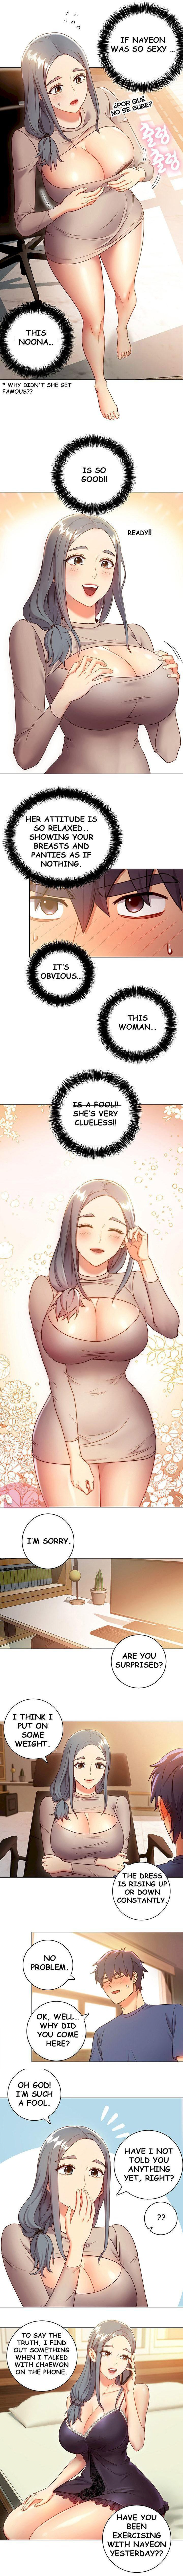 [Neck Pilllow] Stepmother Friends Ch.39/? [English] [Hentai Universe] NEW! 13/10/2020 193